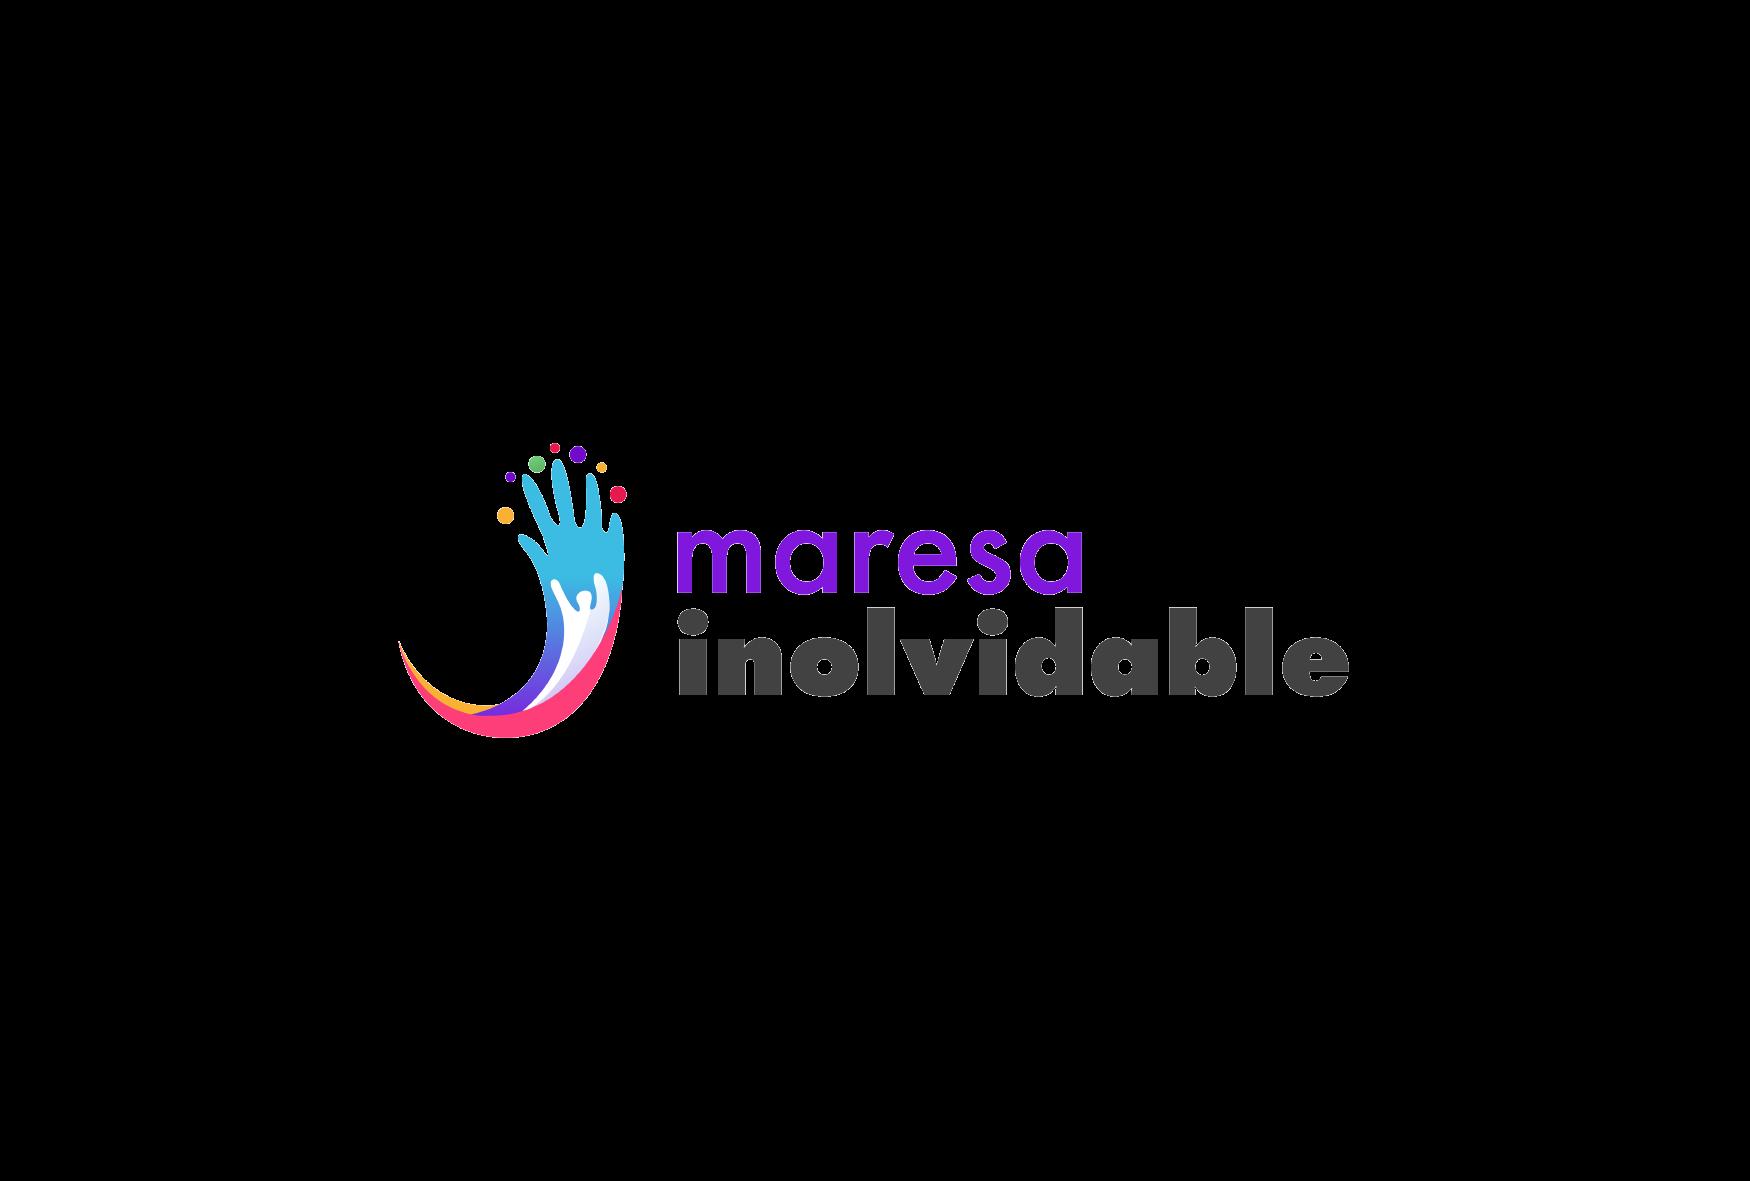 Maresa-Inolvidable-Logo